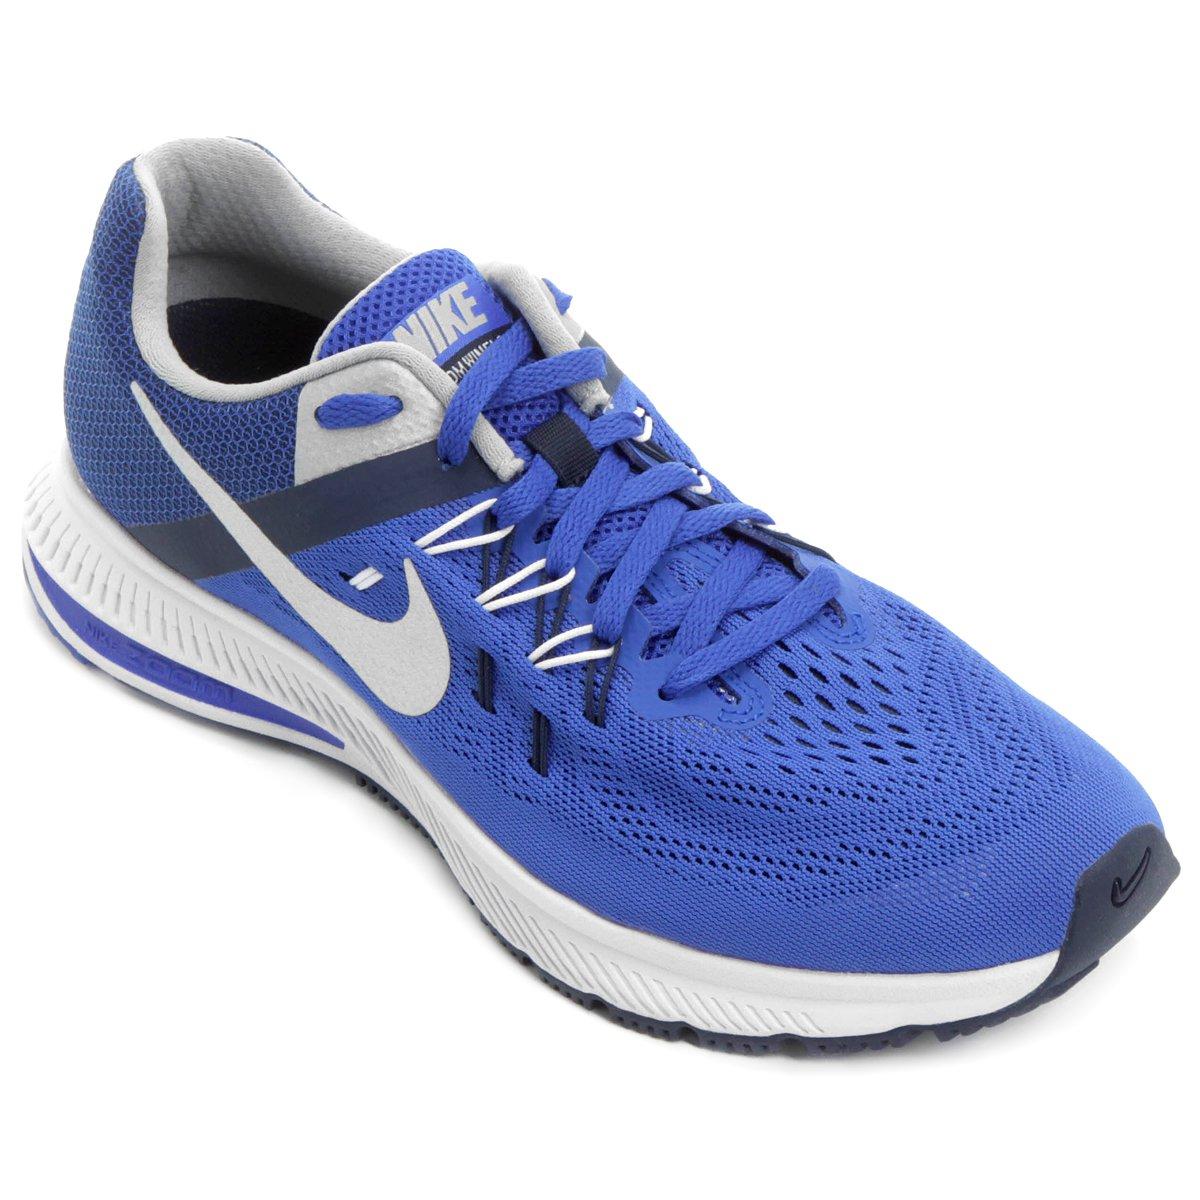 50ade726522 Tênis Nike Zoom Winflo 2 Masculino - Compre Agora